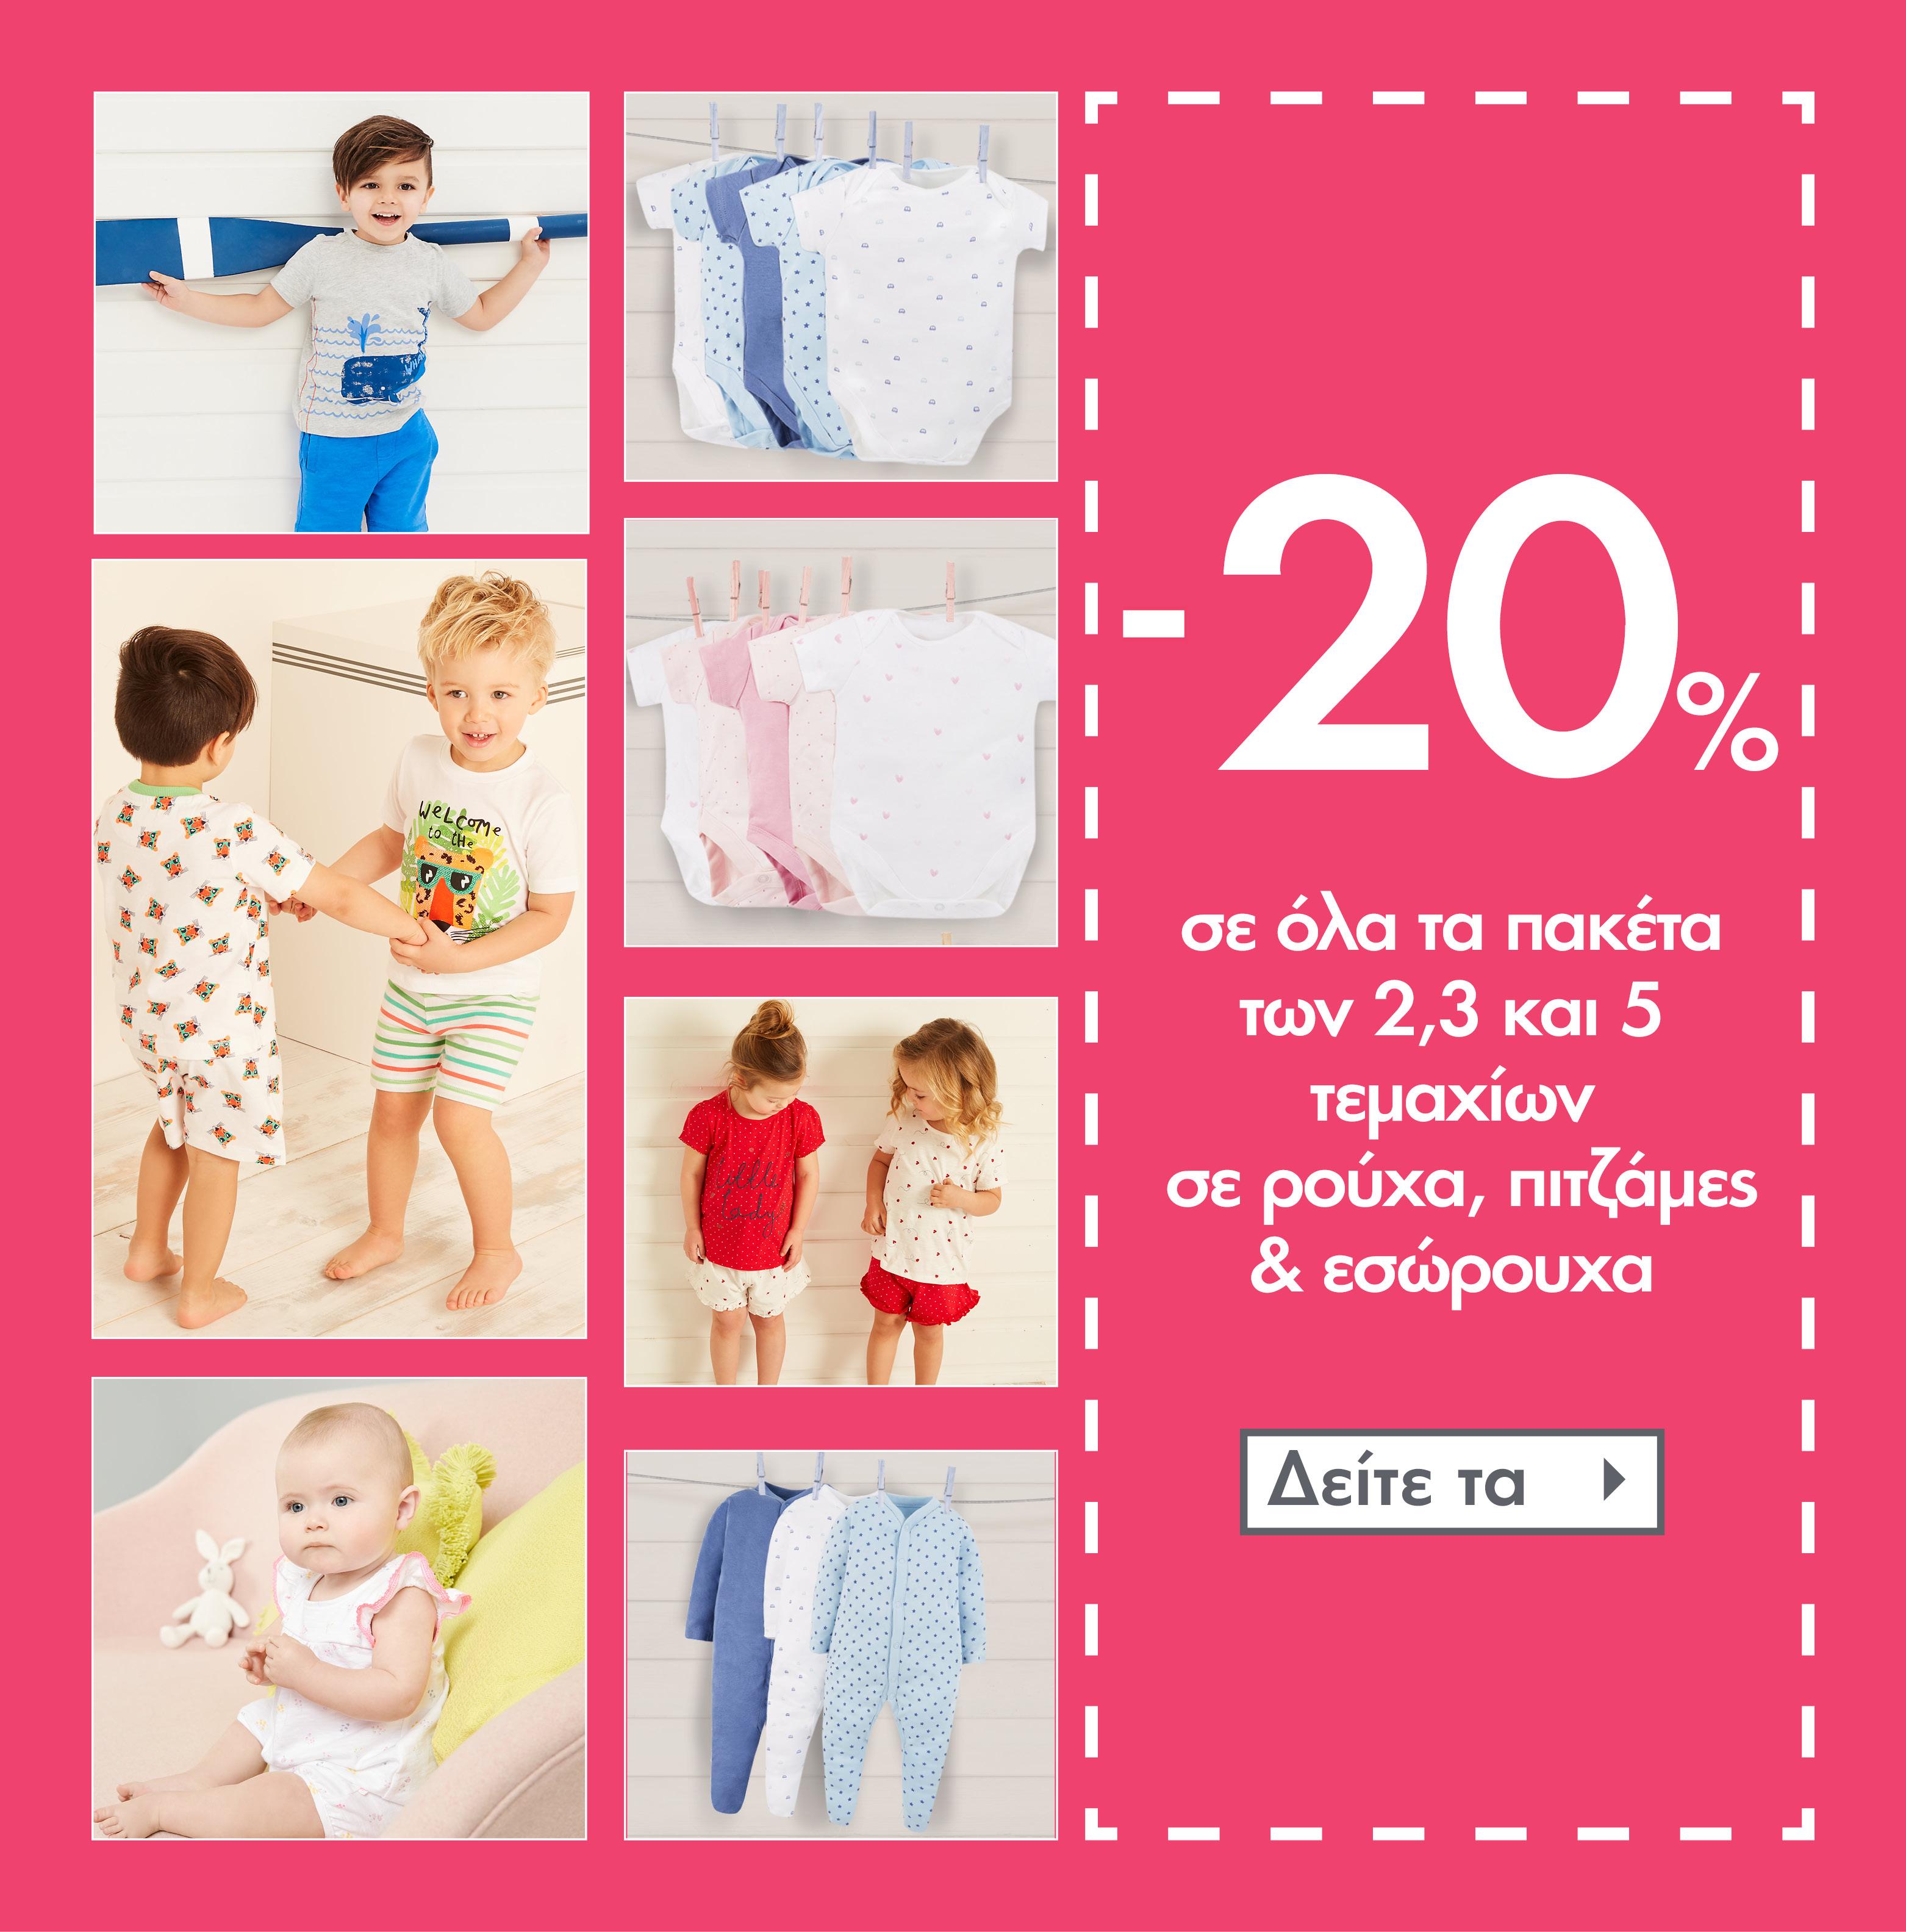 5f2e61bf95e Καρότσια, παιδικά, βρεφικά και ρούχα εγκυμοσύνης από το Mothercare